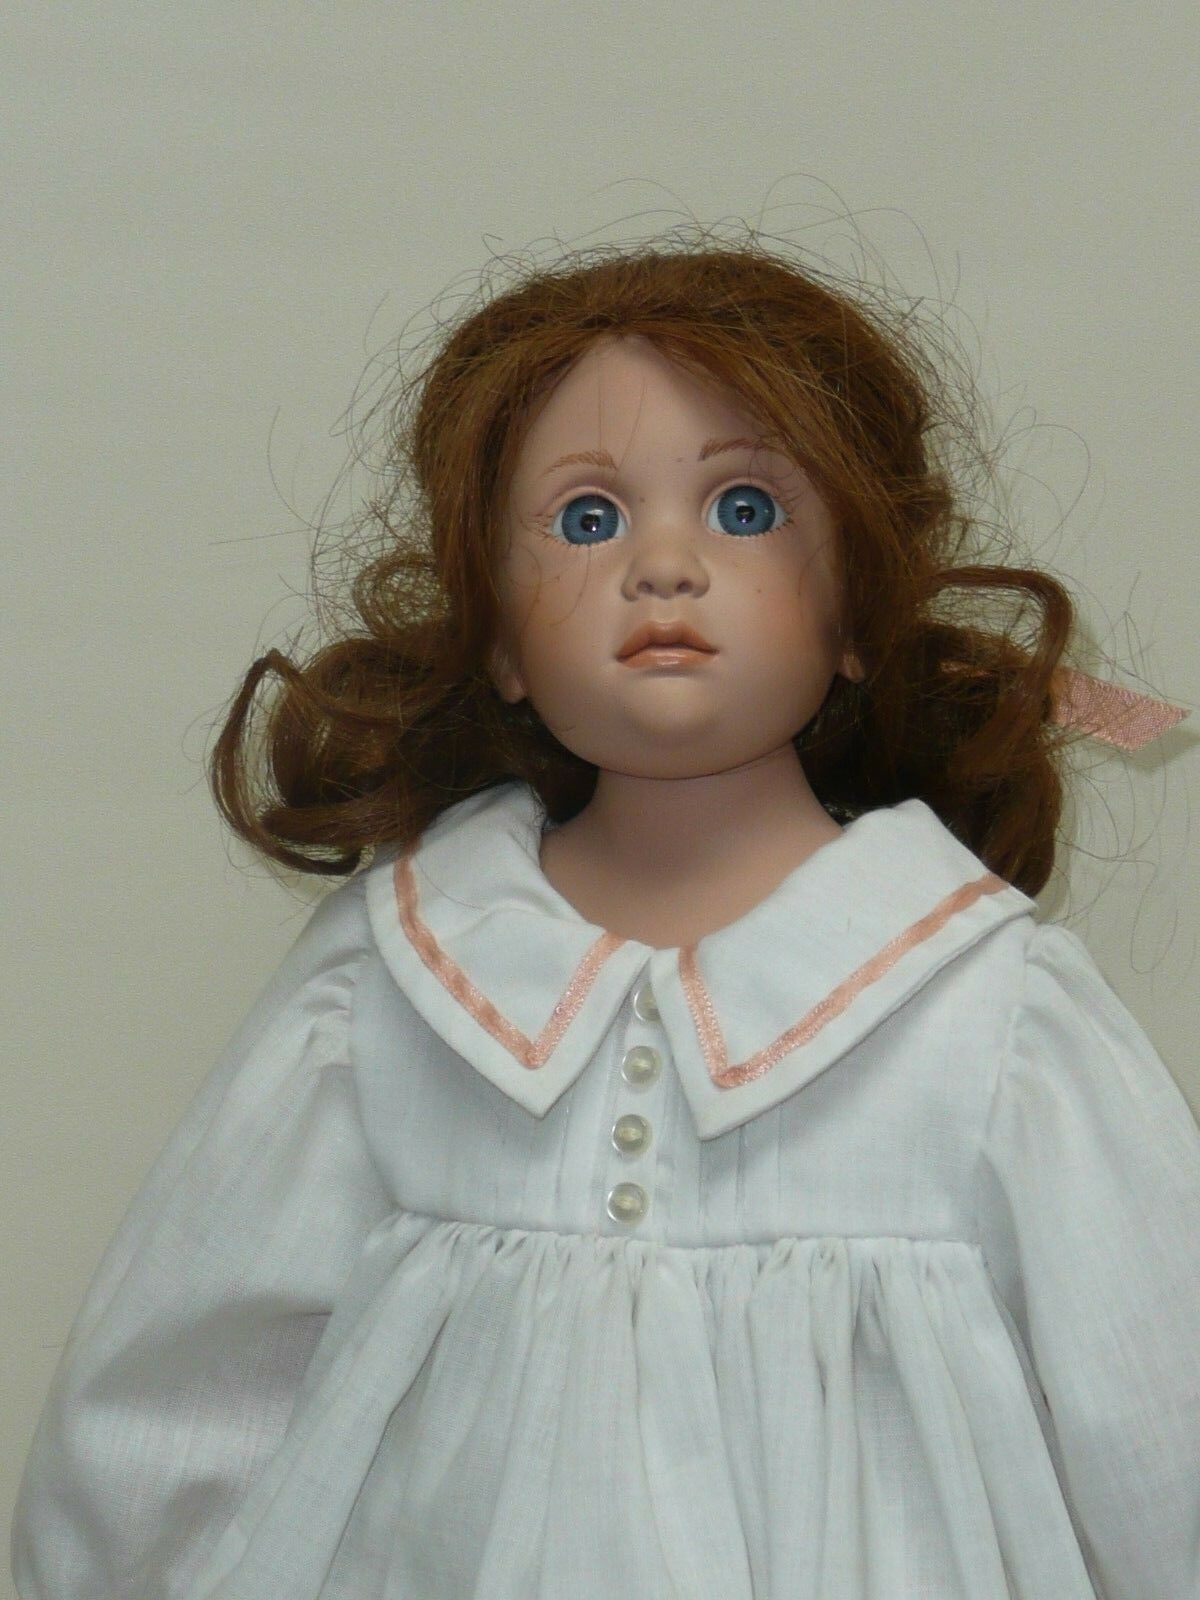 16  Hildegard Günzel Alexander Doll quema de pelo rojo con ojos azul profundo mar